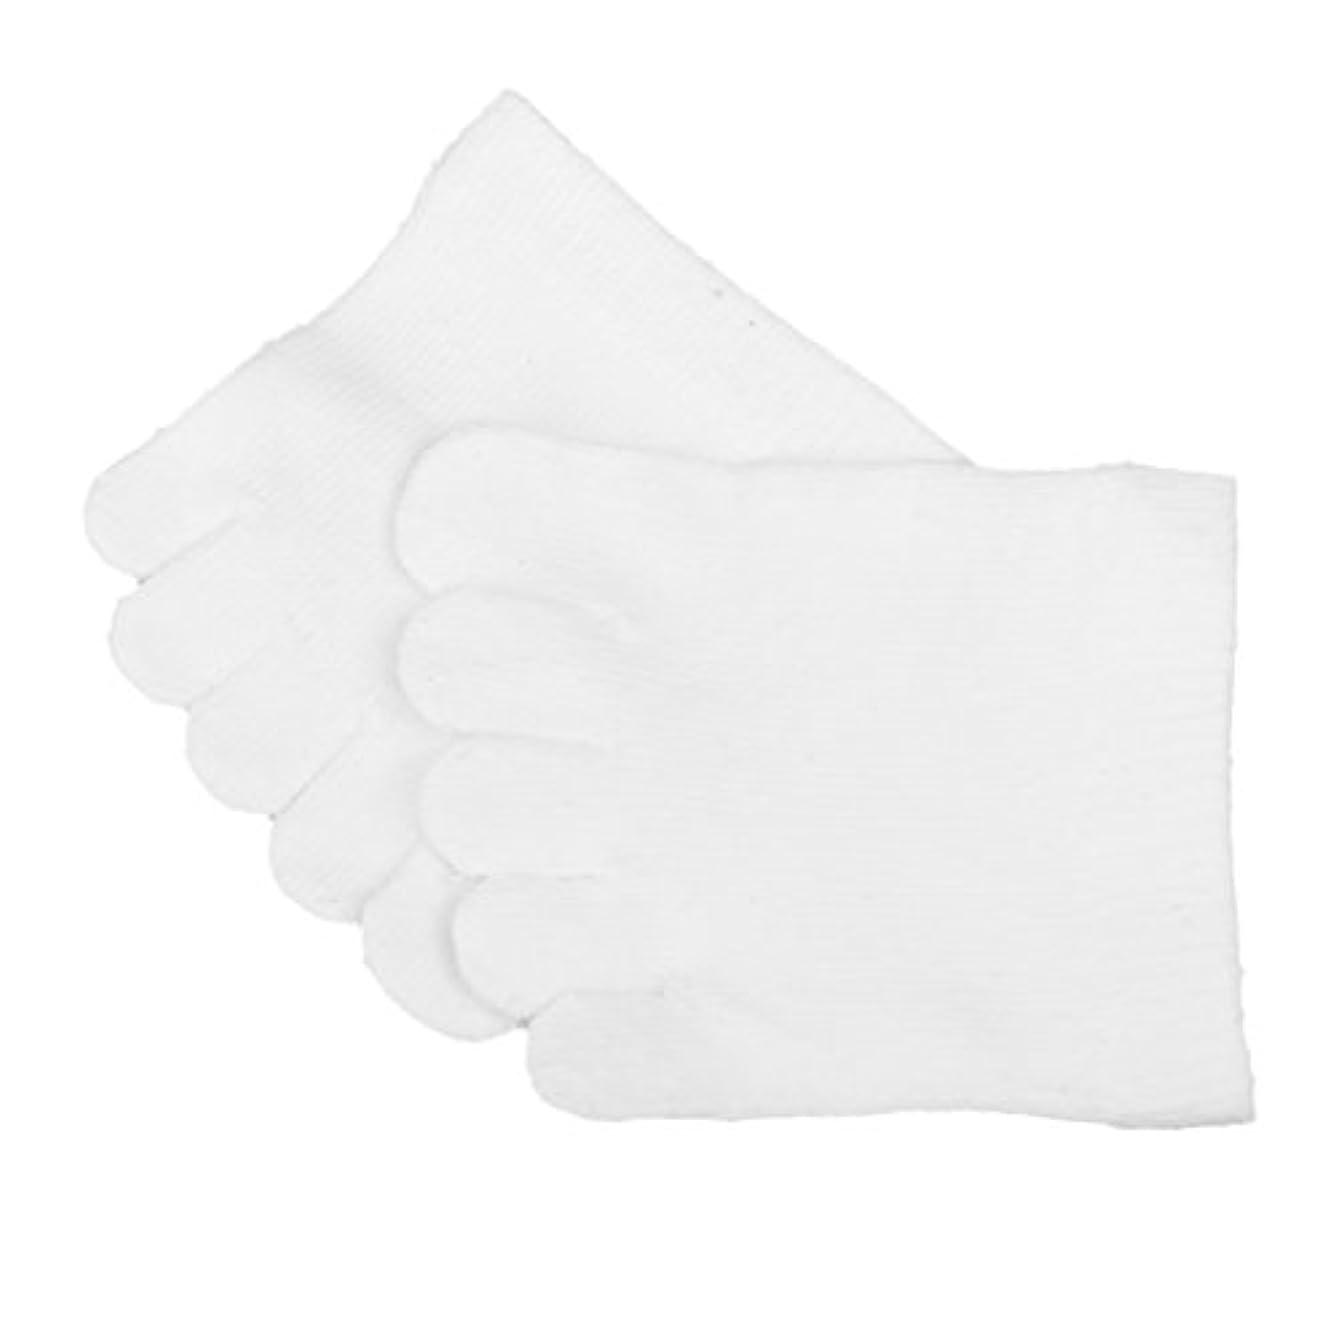 【Footful】ソックス 靴下 5本指つま先ソックス つま先5本指靴下 全2色 (白)